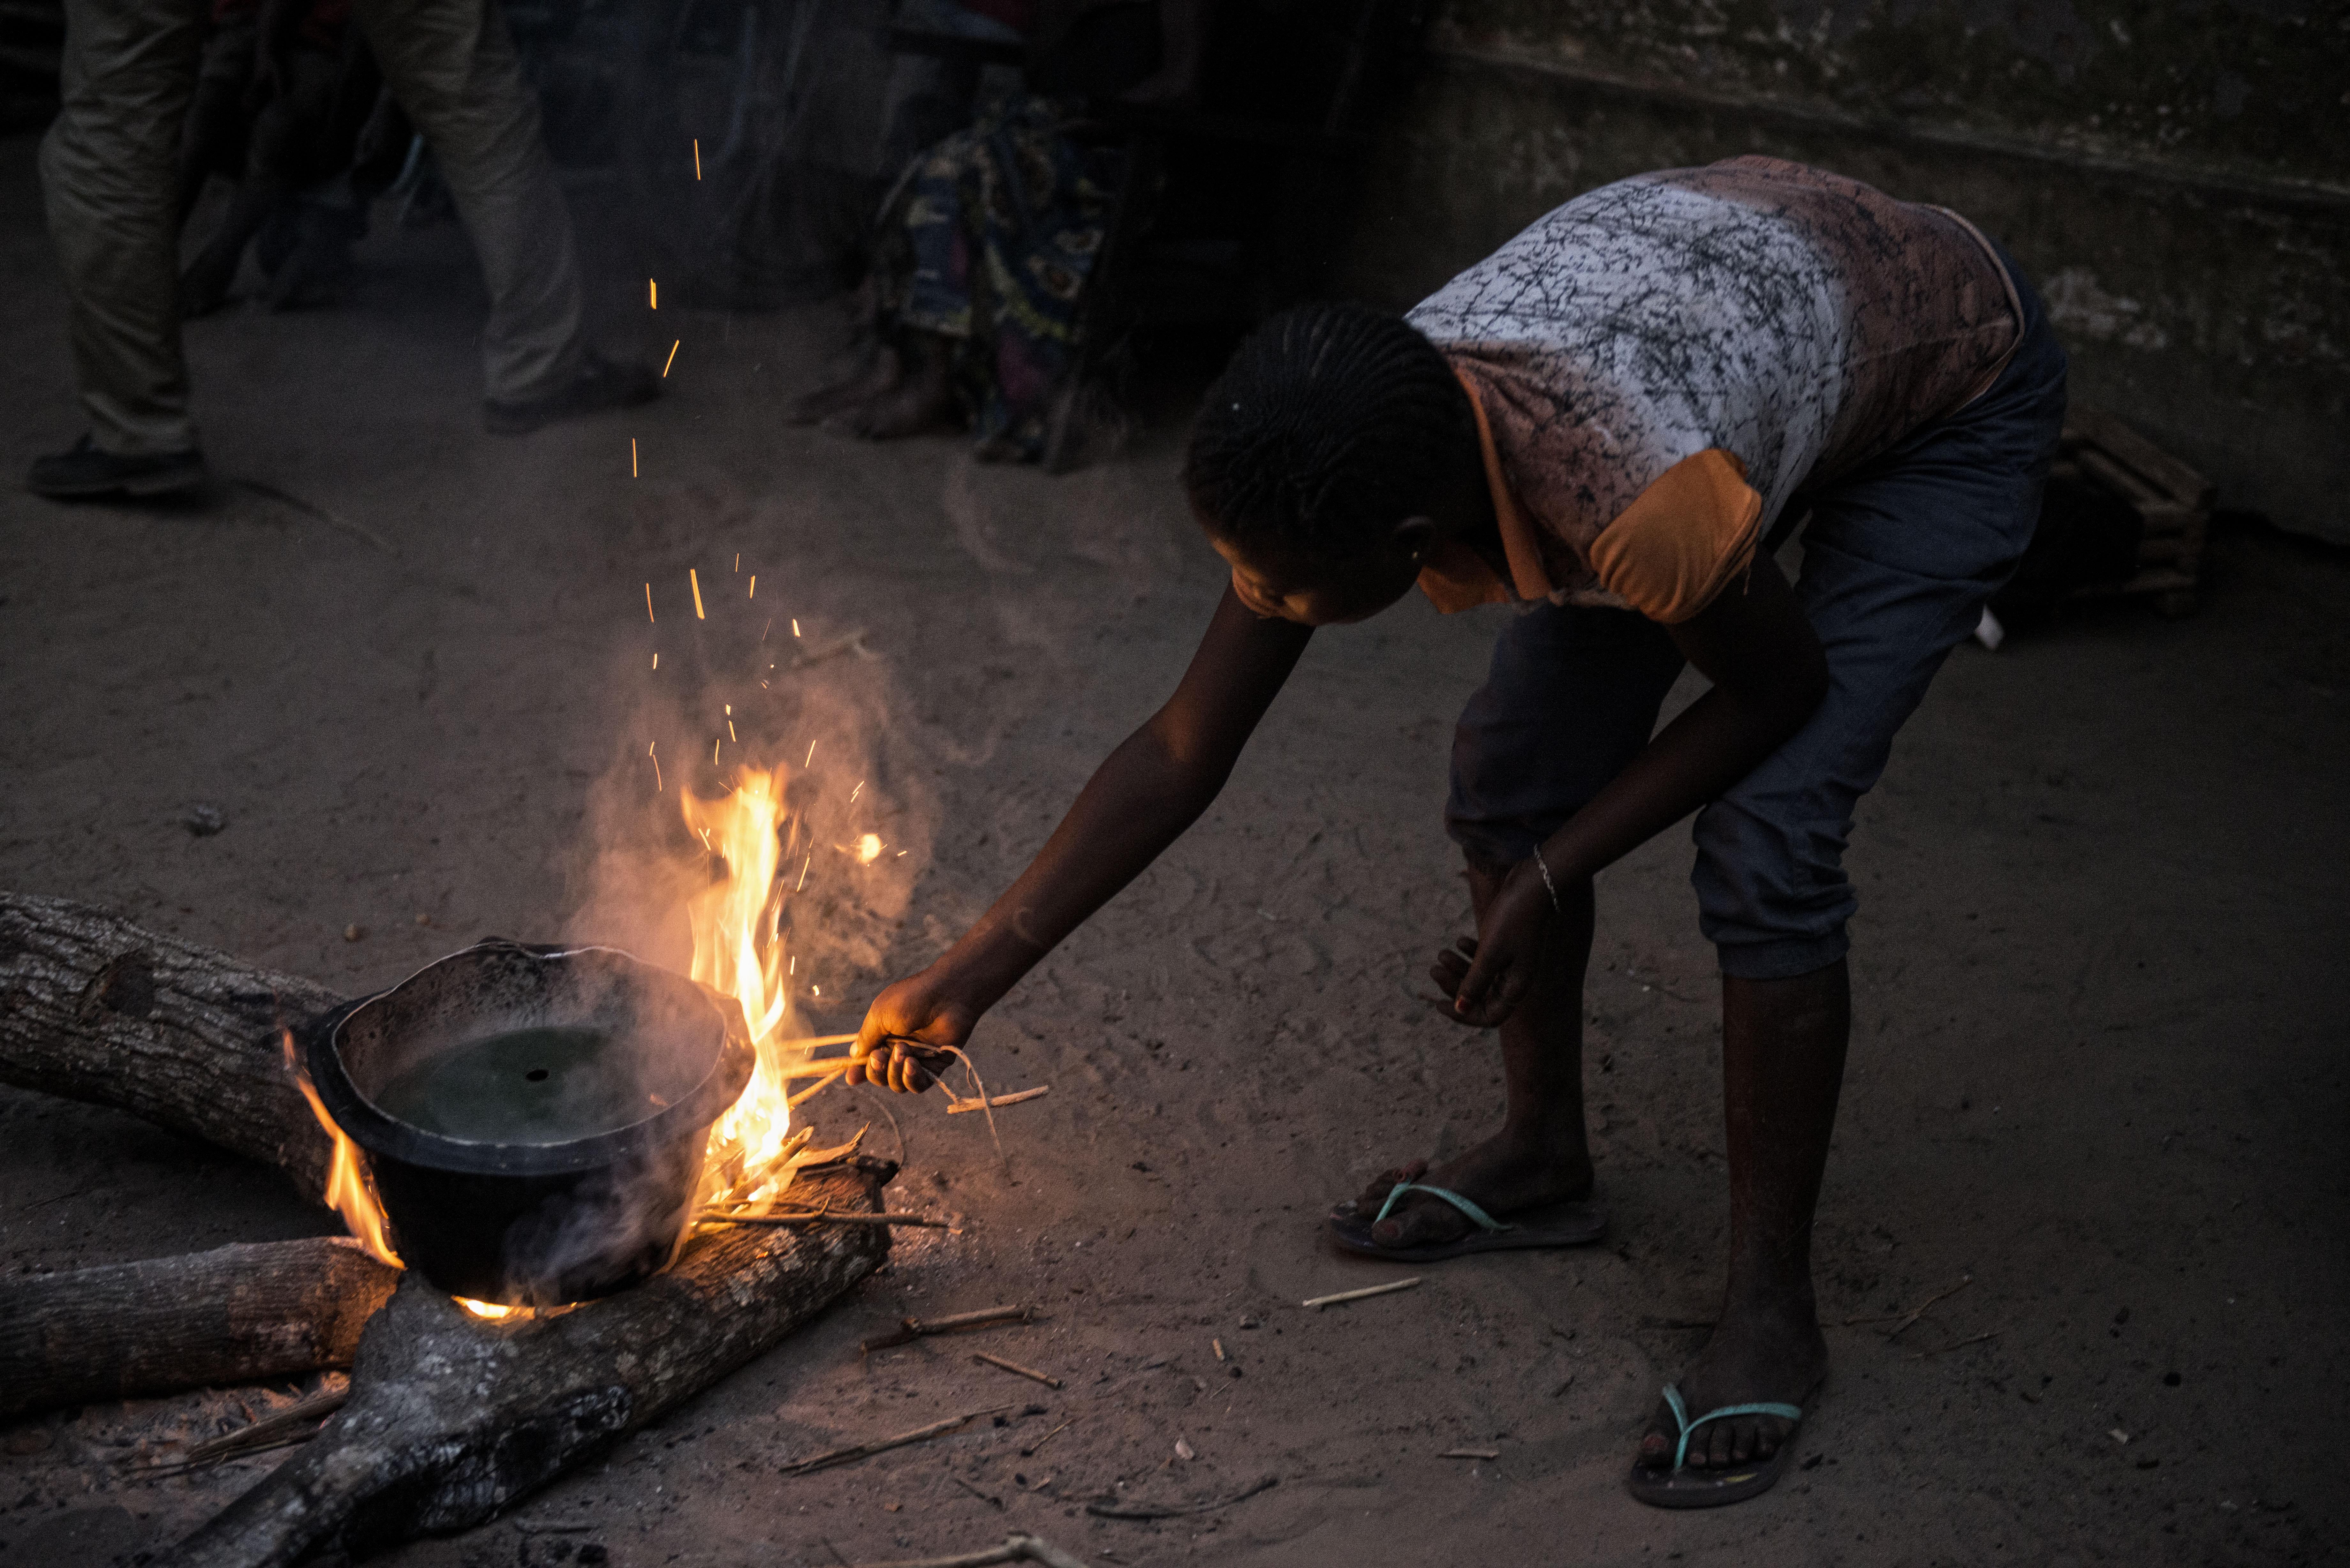 Cassava and Konzo, the Crippling Disease | Pulitzer Center